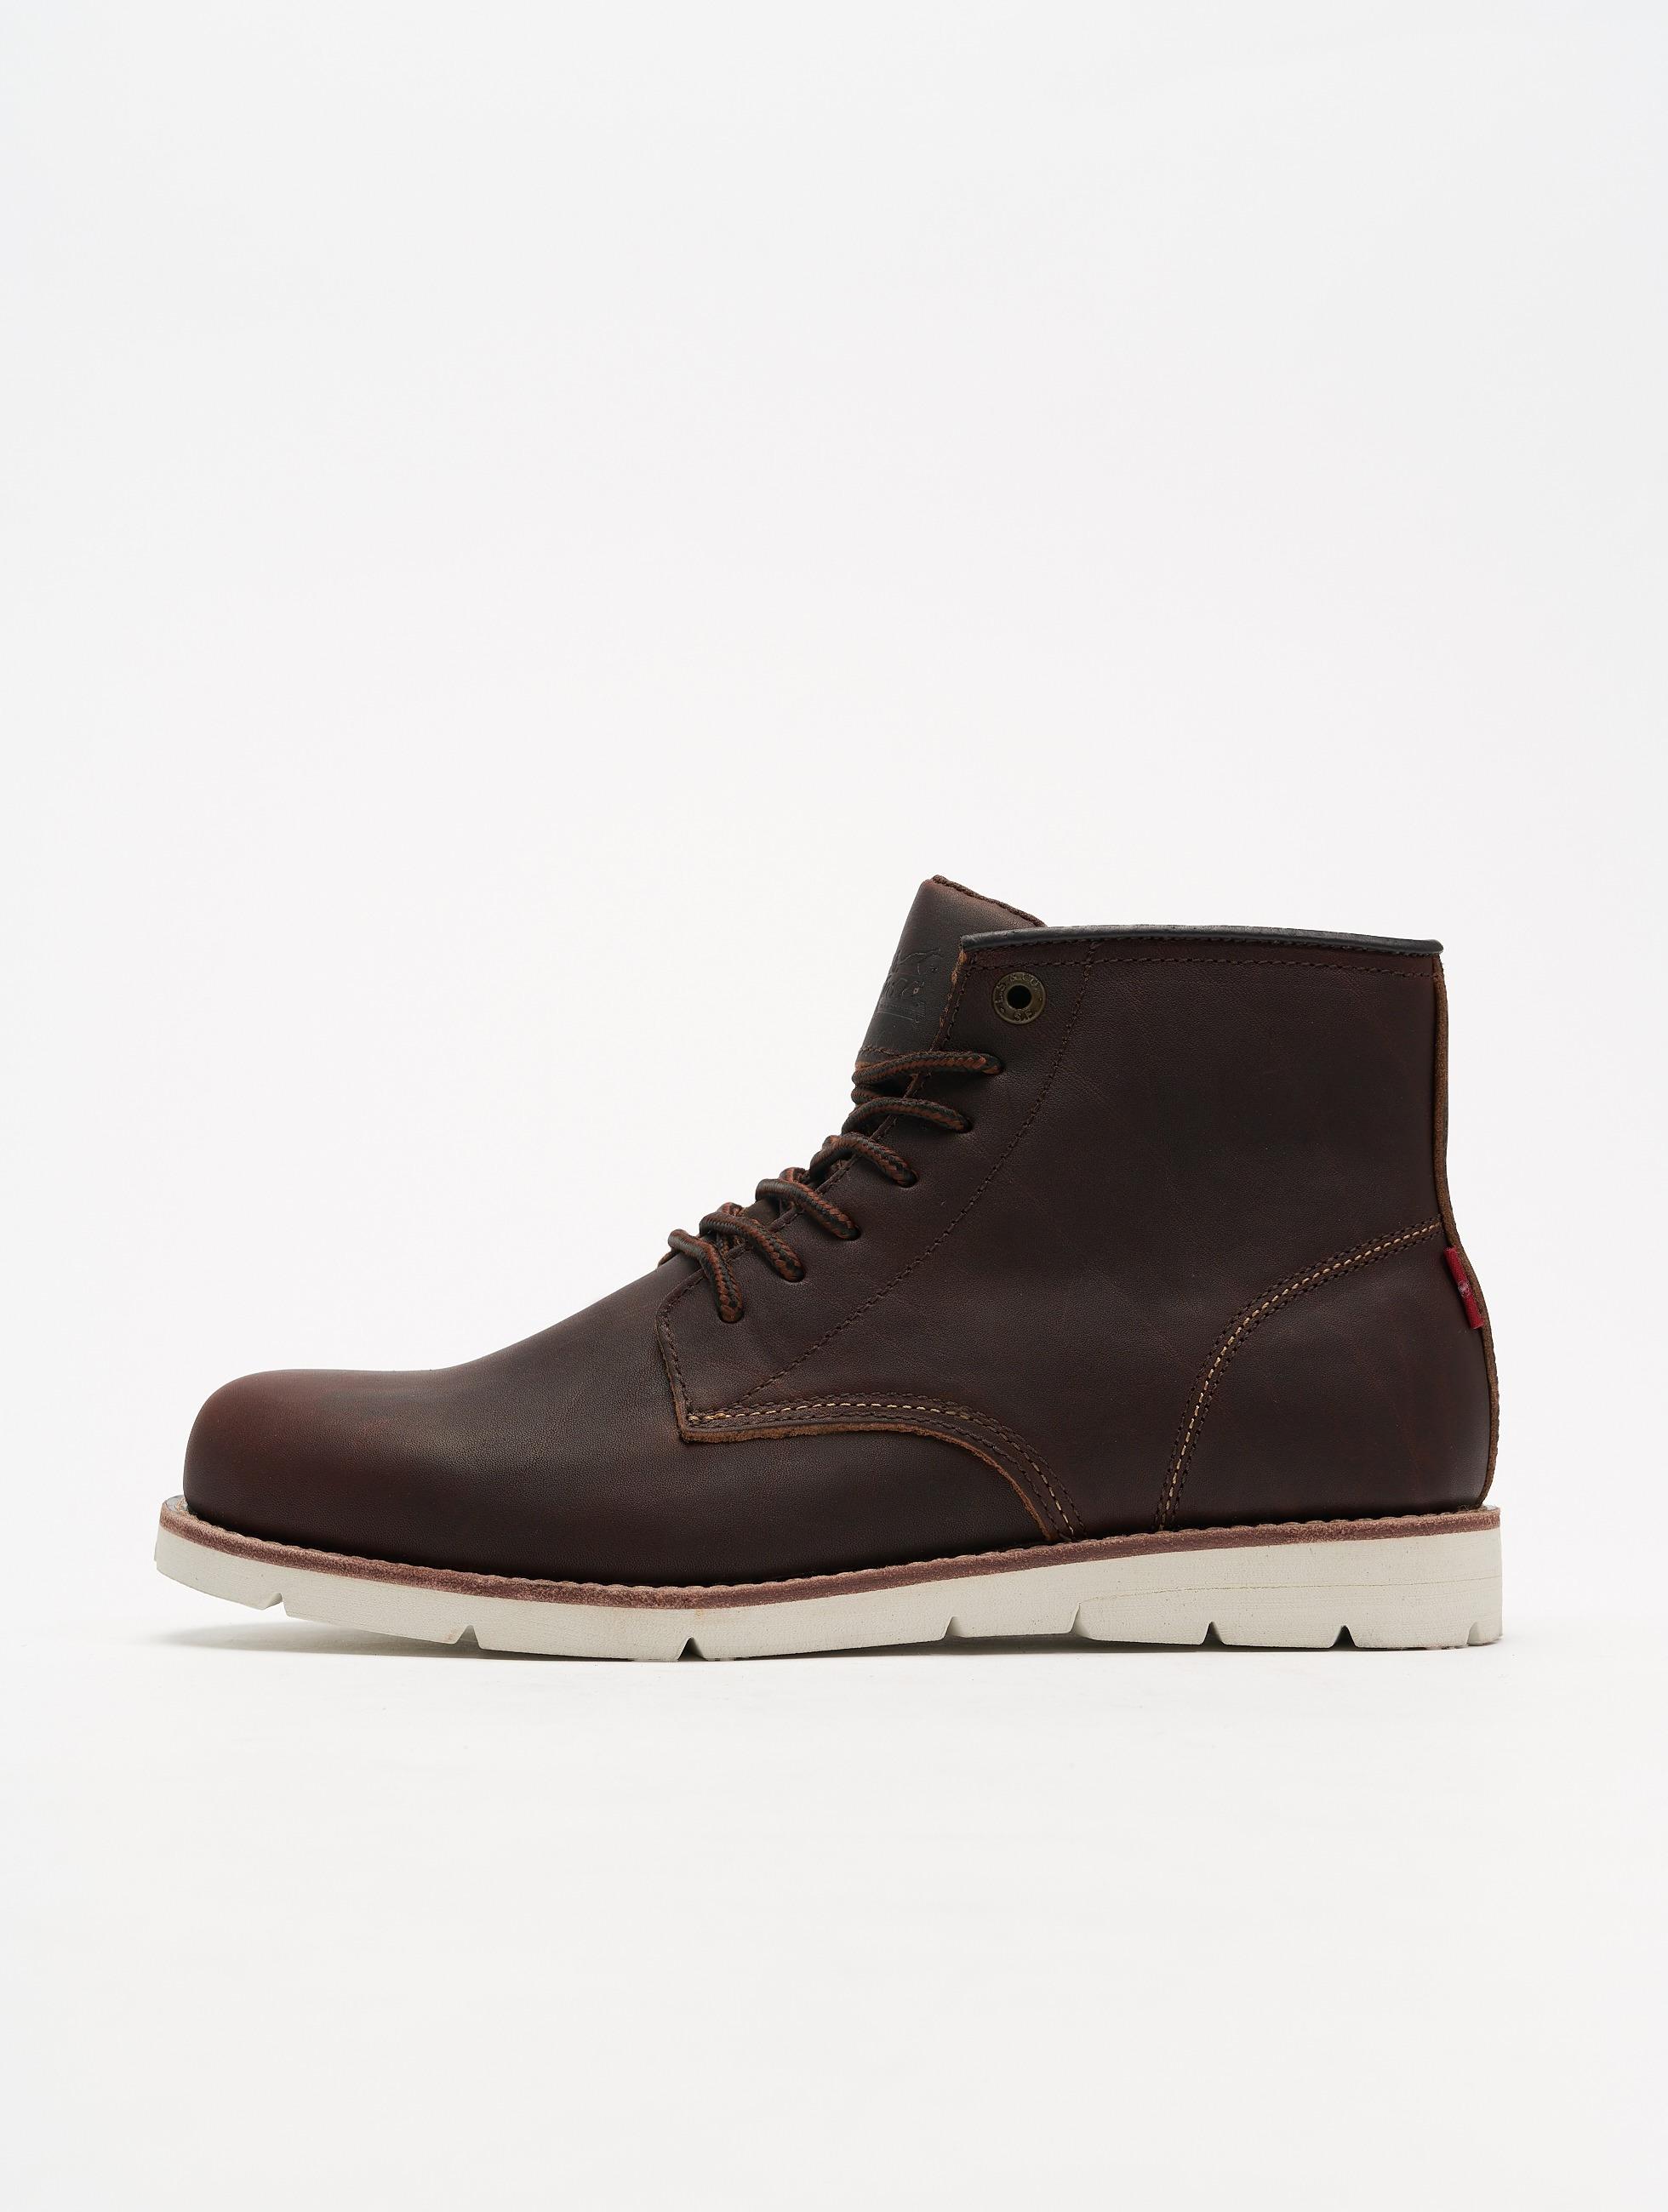 levi 39 s herren schuhe boots jax clean high ebay. Black Bedroom Furniture Sets. Home Design Ideas